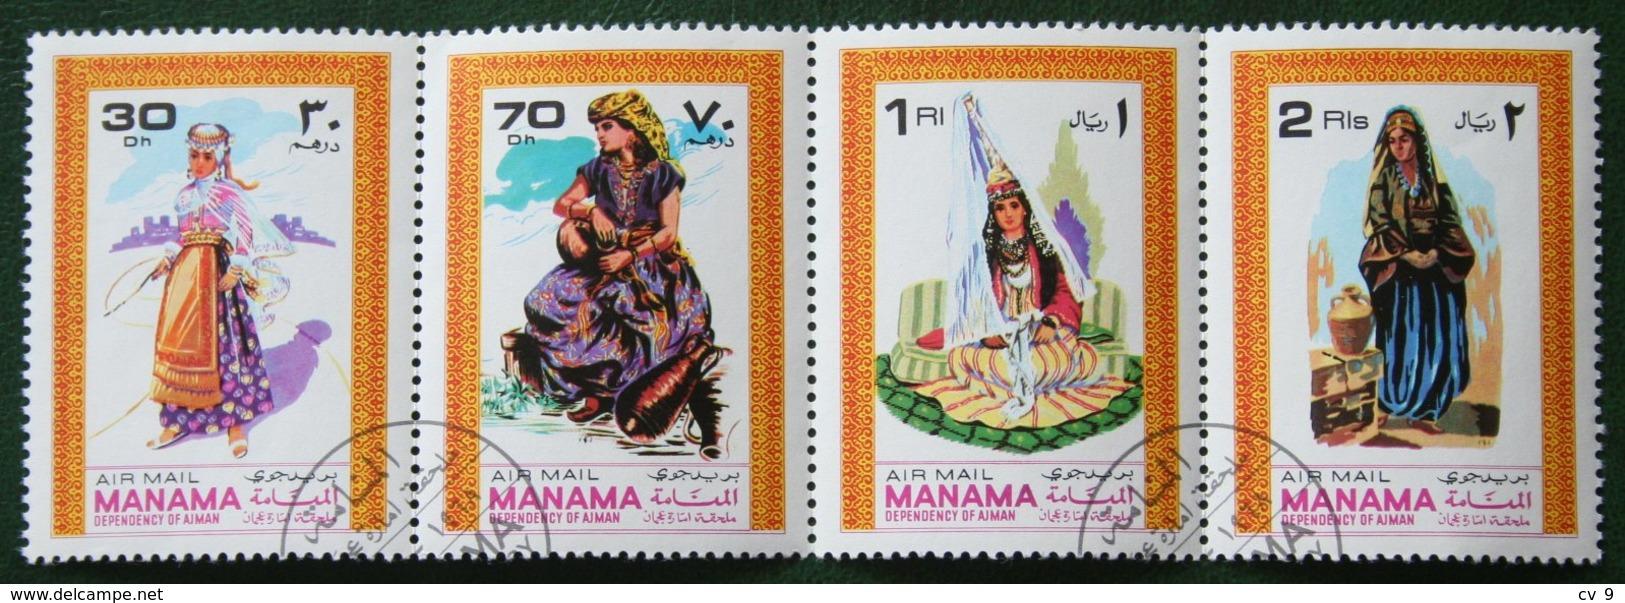 Costumes Traditionnels Trachten  AIRMAIL 1968 (Mi 333 YT 328) Used Gebruikt Oblitere MANAMA - Manama